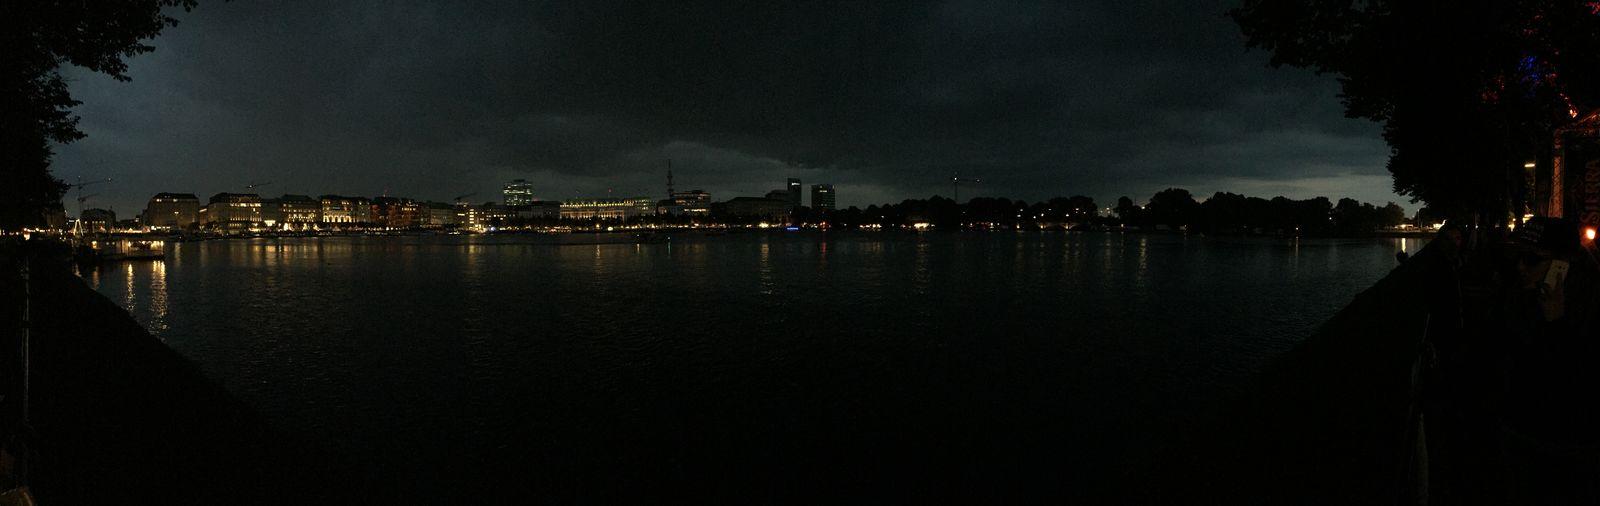 Hamburg, Alsterfest.03.09.2015